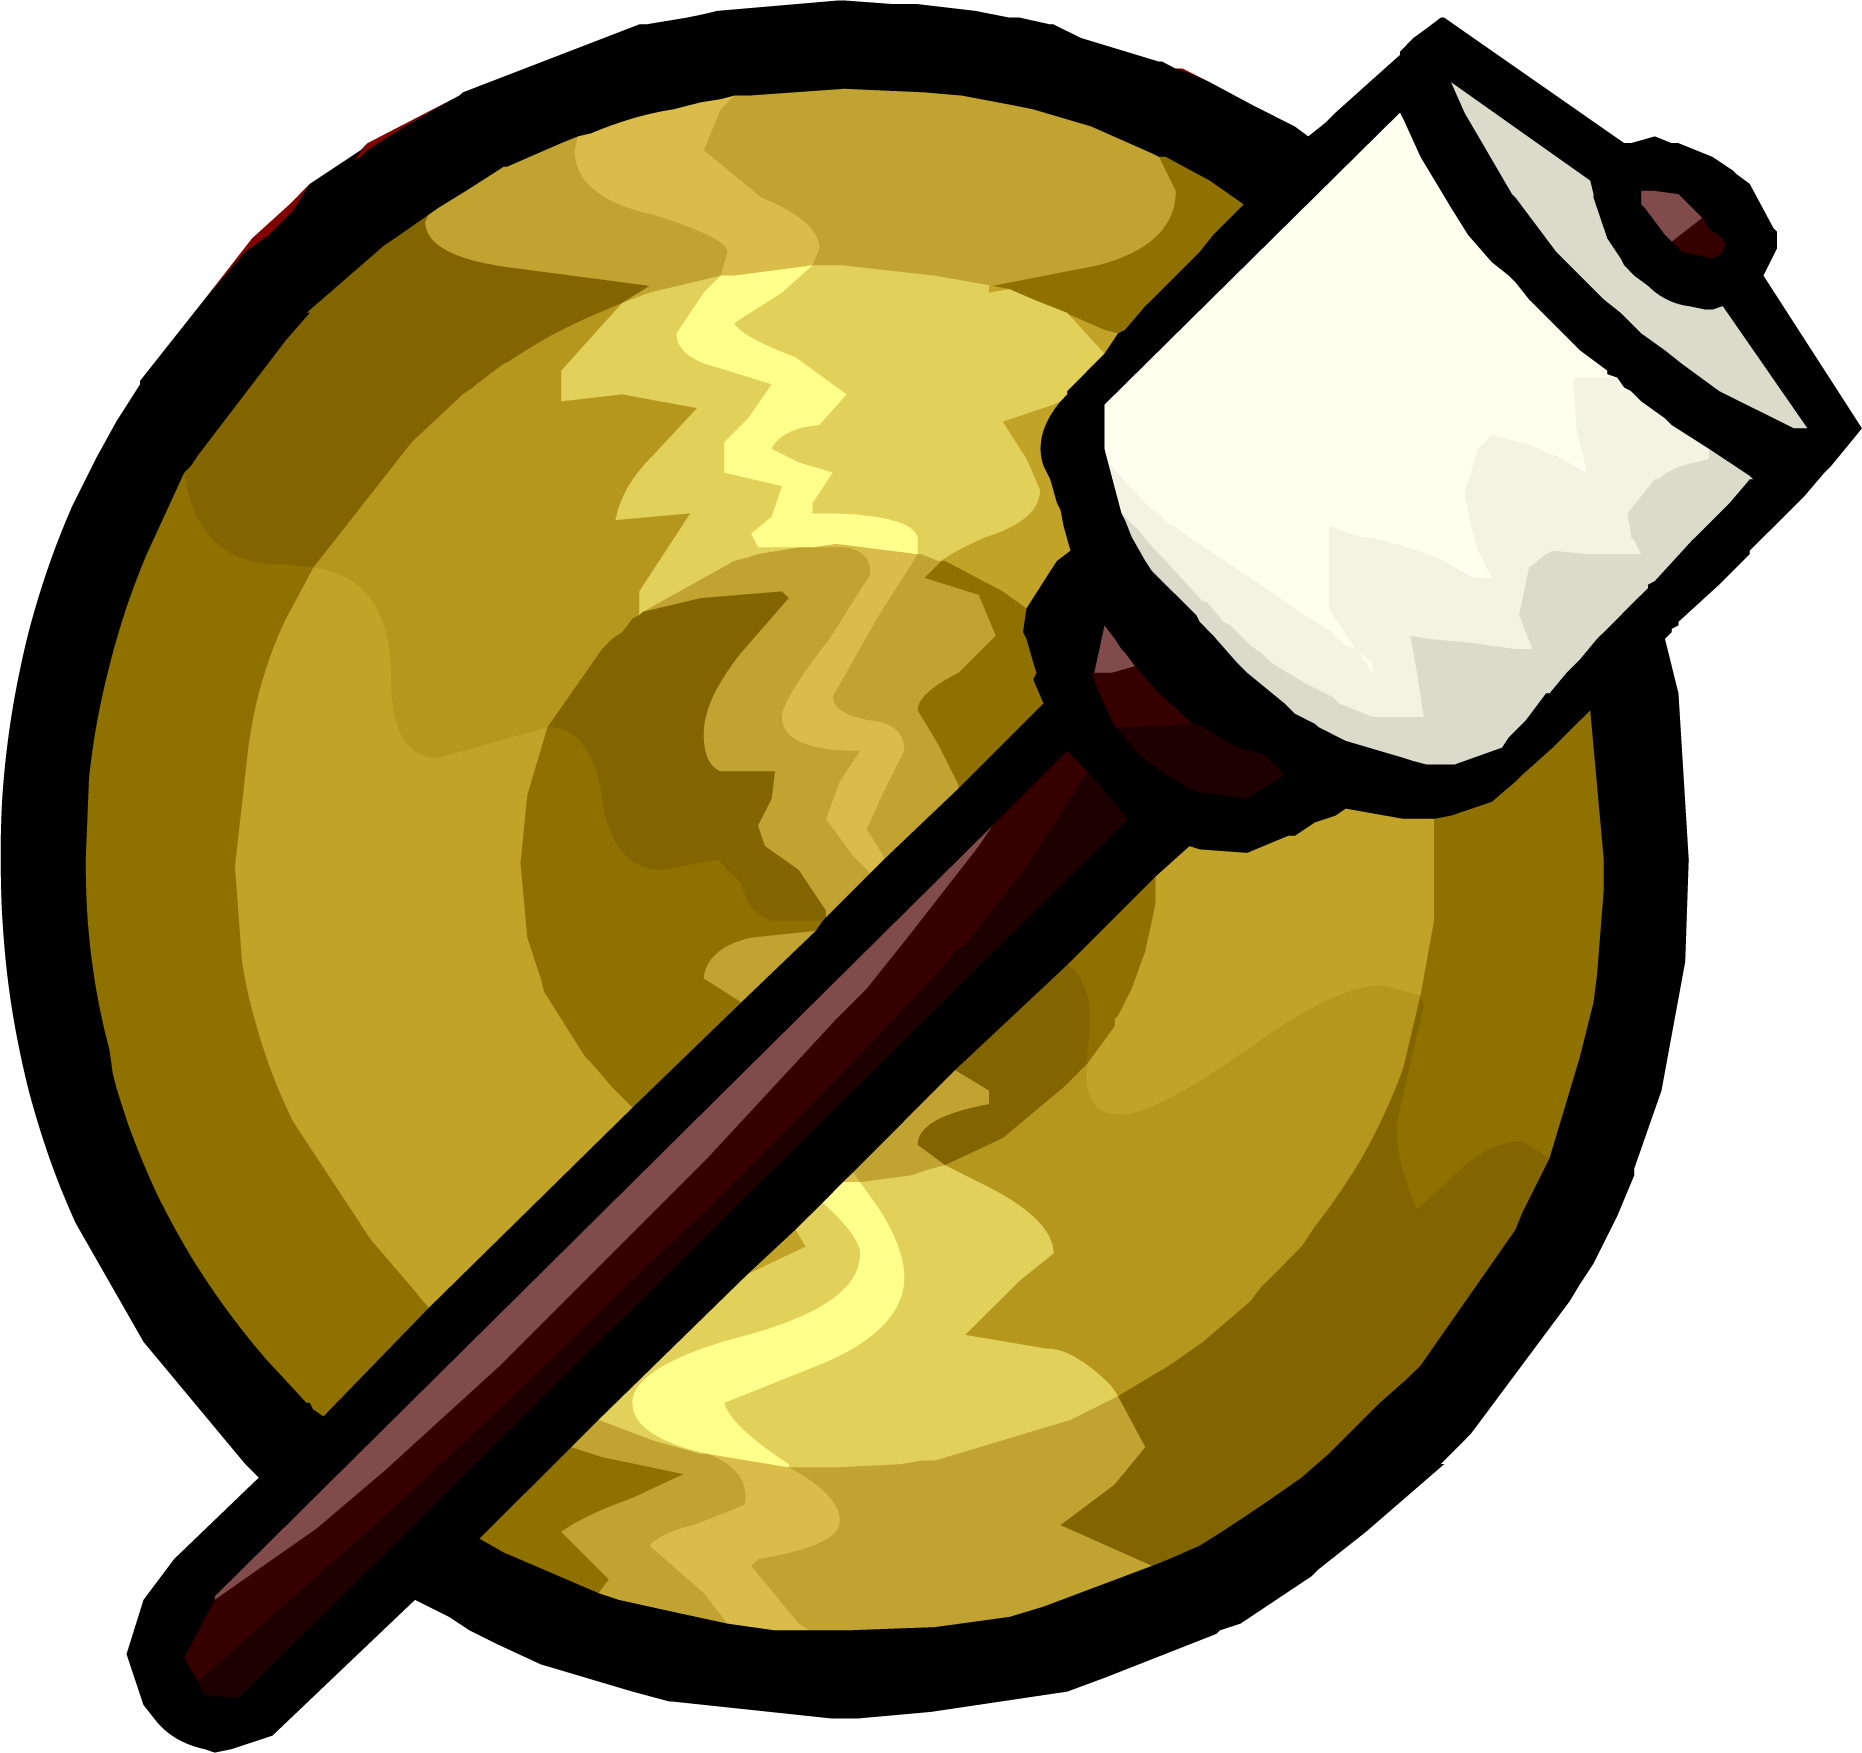 Hand Gong Club Penguin Wiki Fandom Powered By Wikia